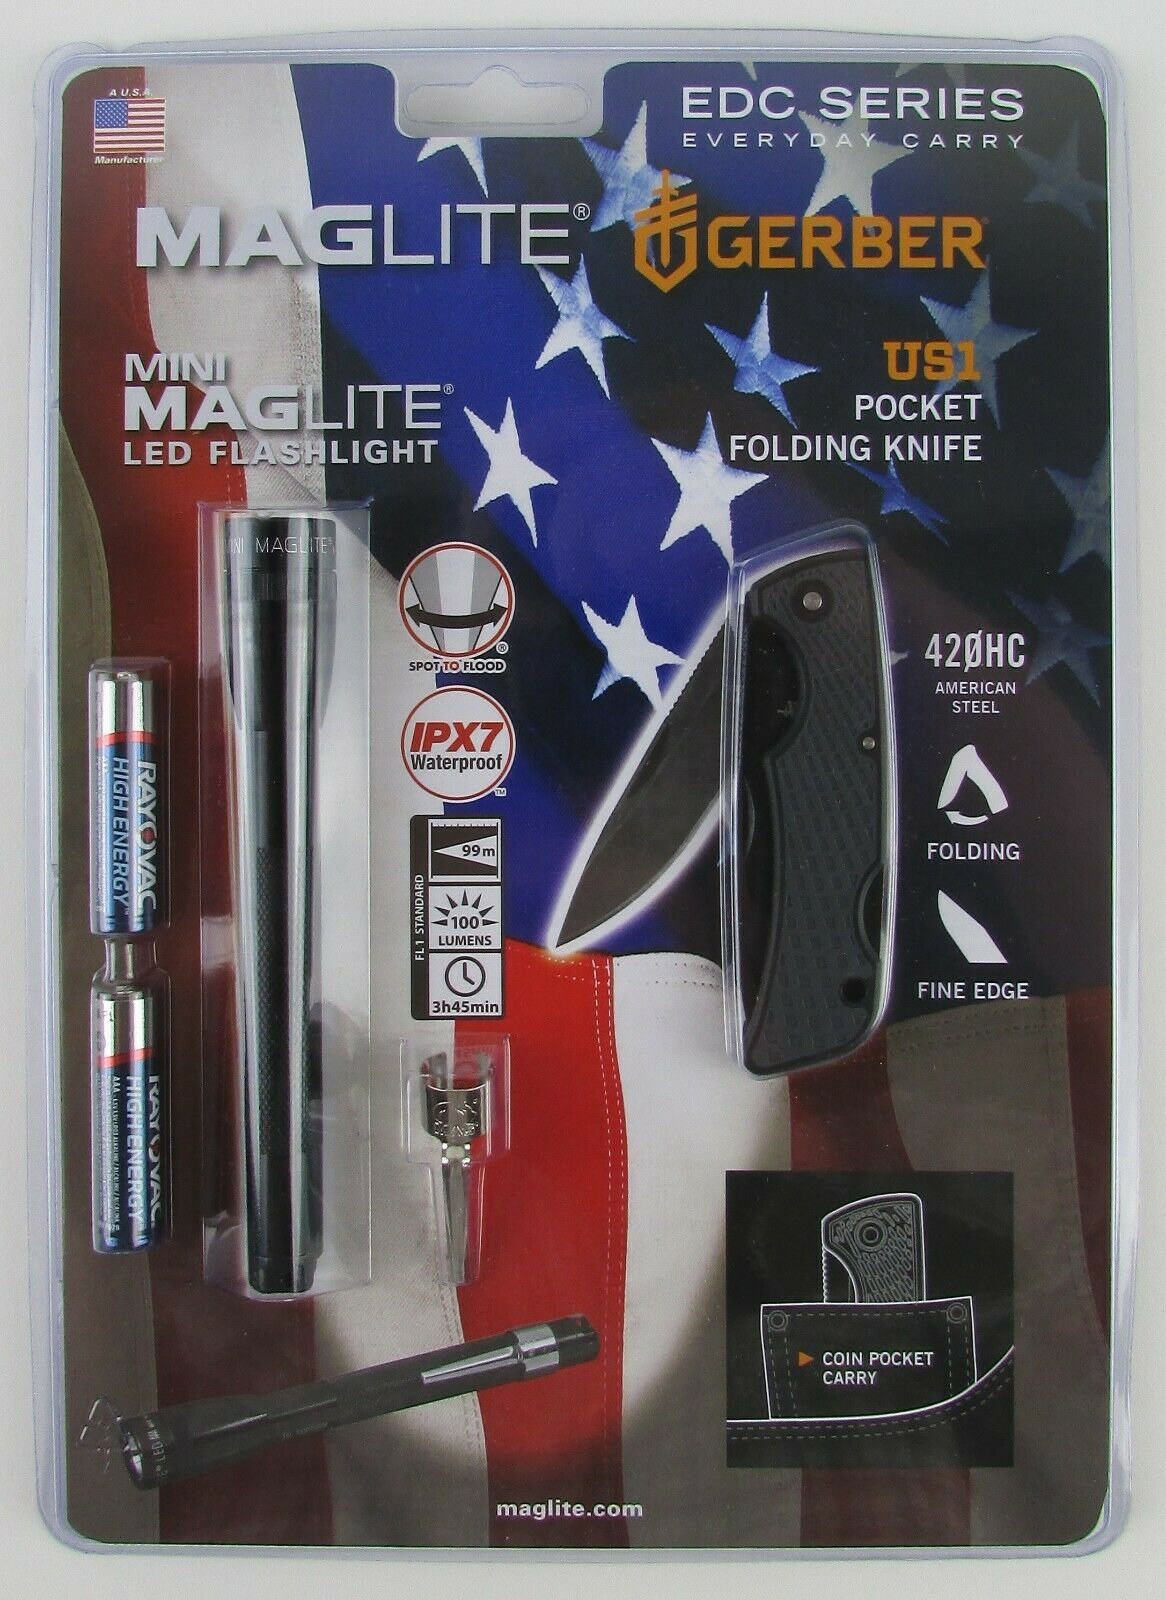 Mini Maglite AAA LED Flashlight IPX7 / Gerber US1 Folding Po